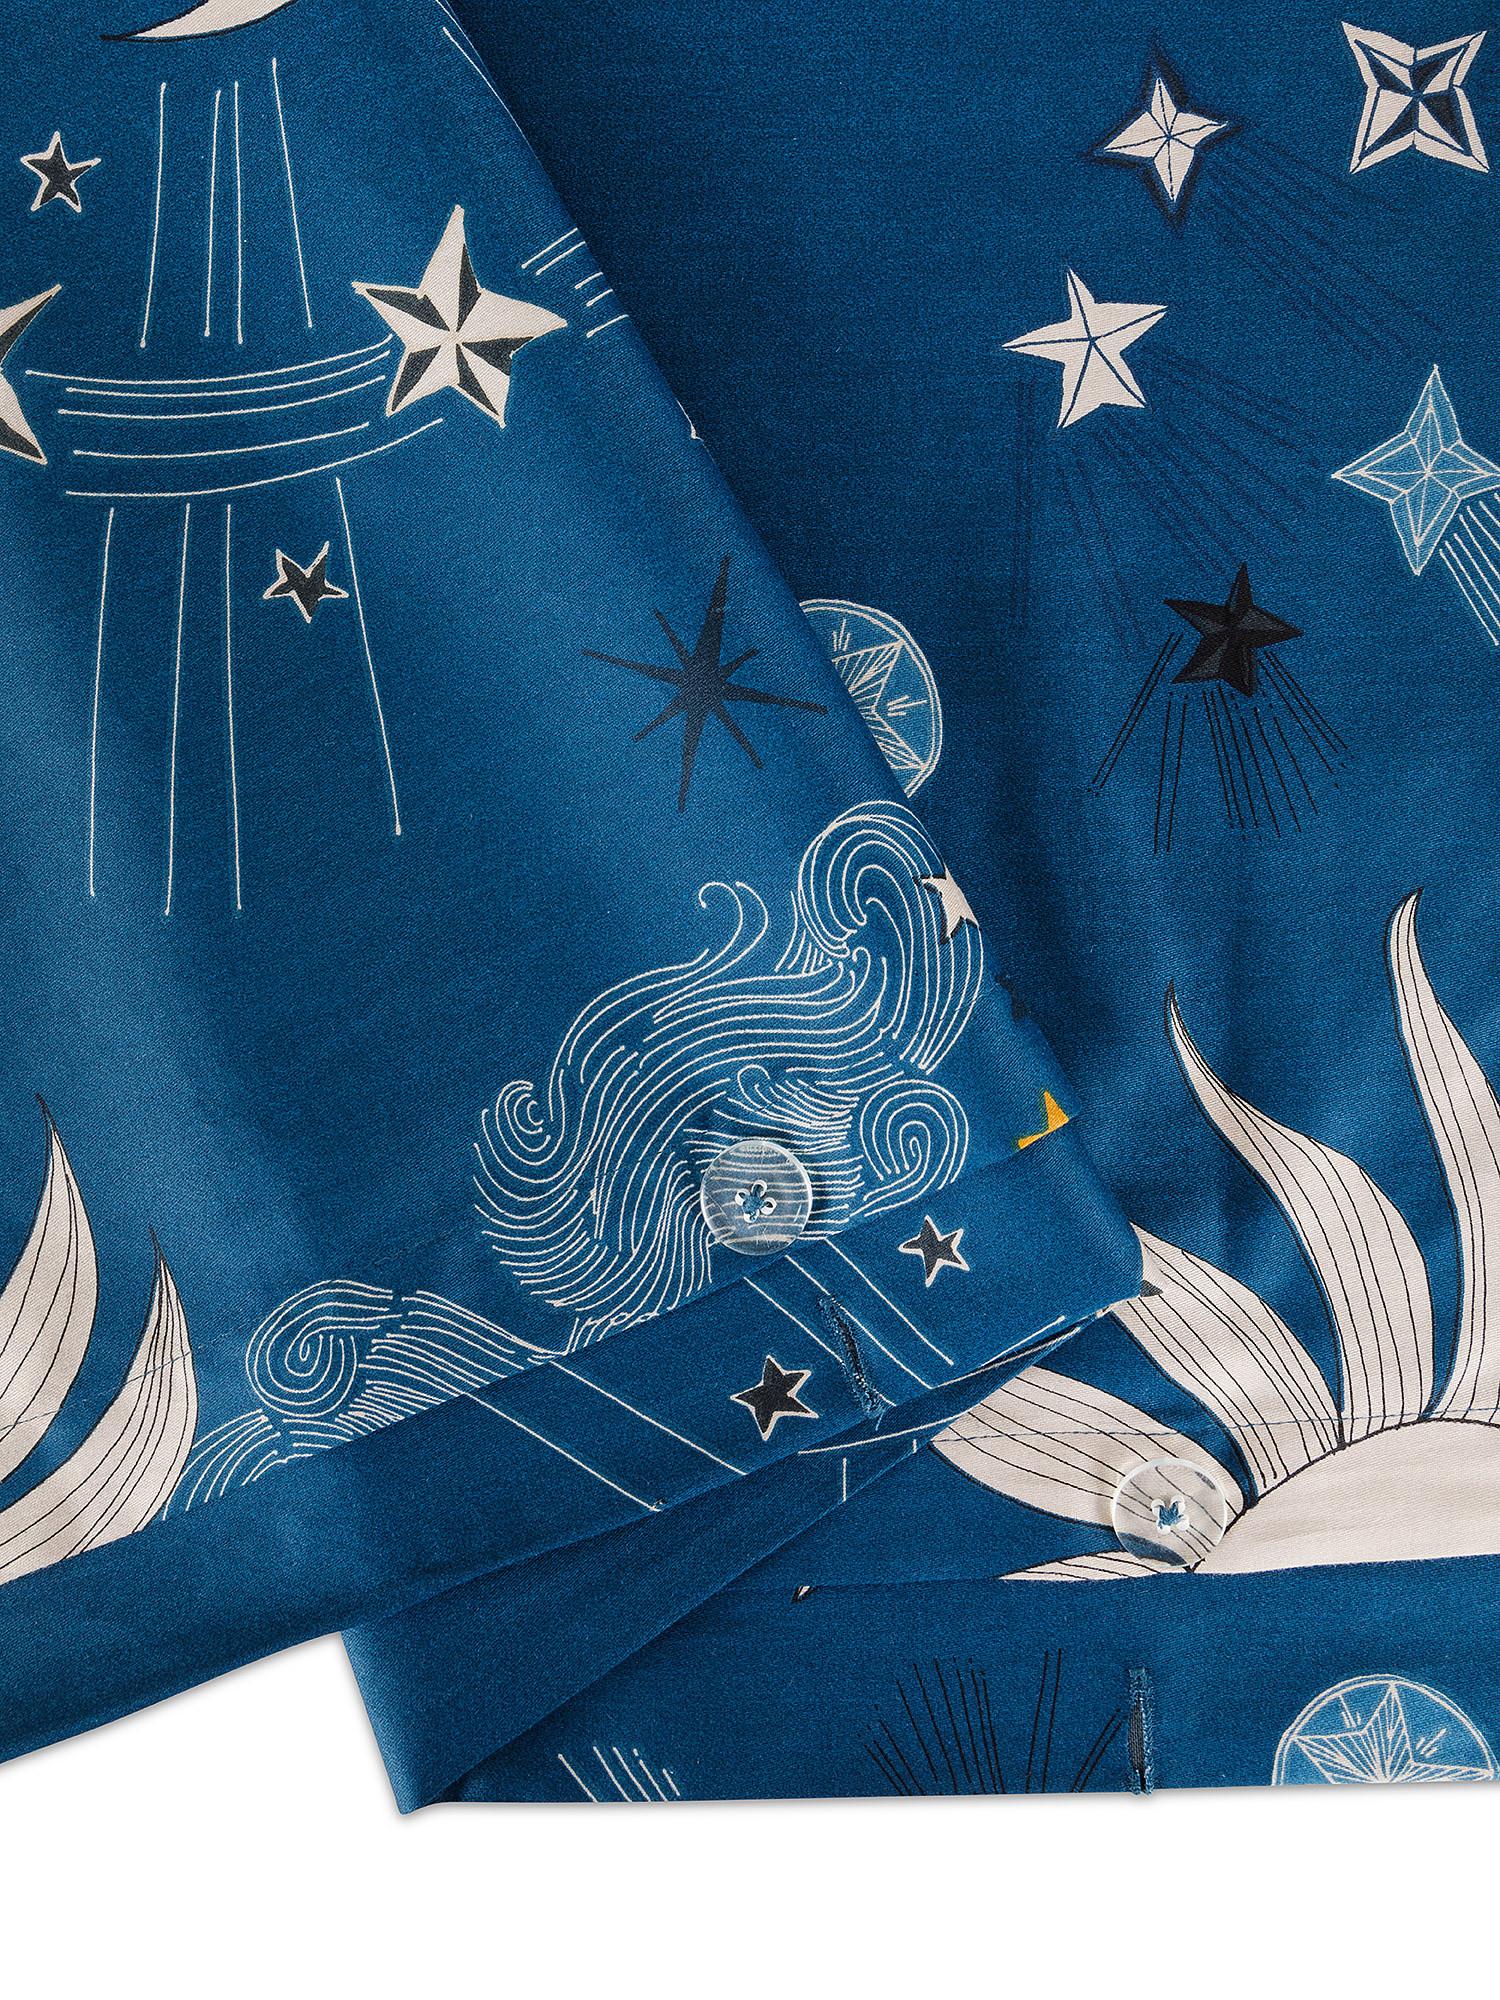 Copripiumino raso di cotone fantasia sole e luna, Blu, large image number 2